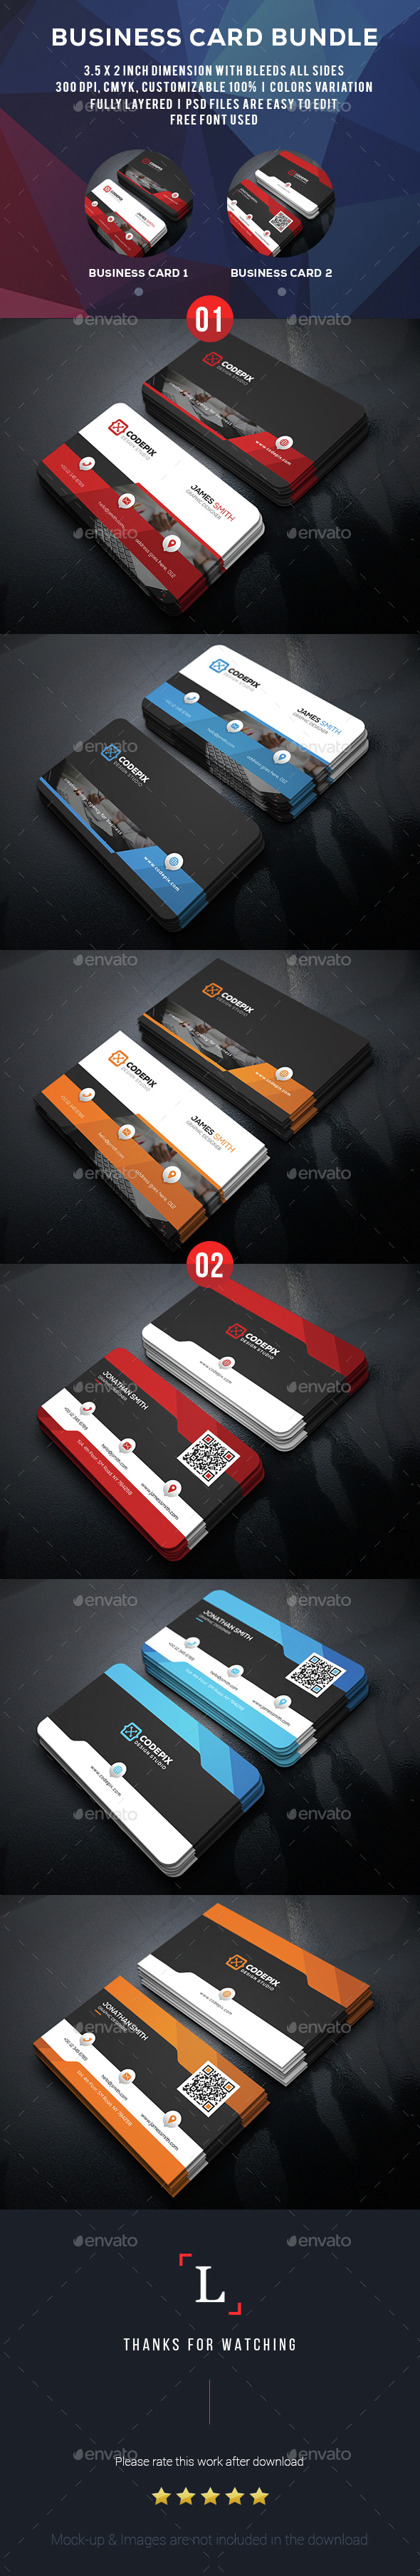 Creative Business Card Bundle - Business Cards Print Templates